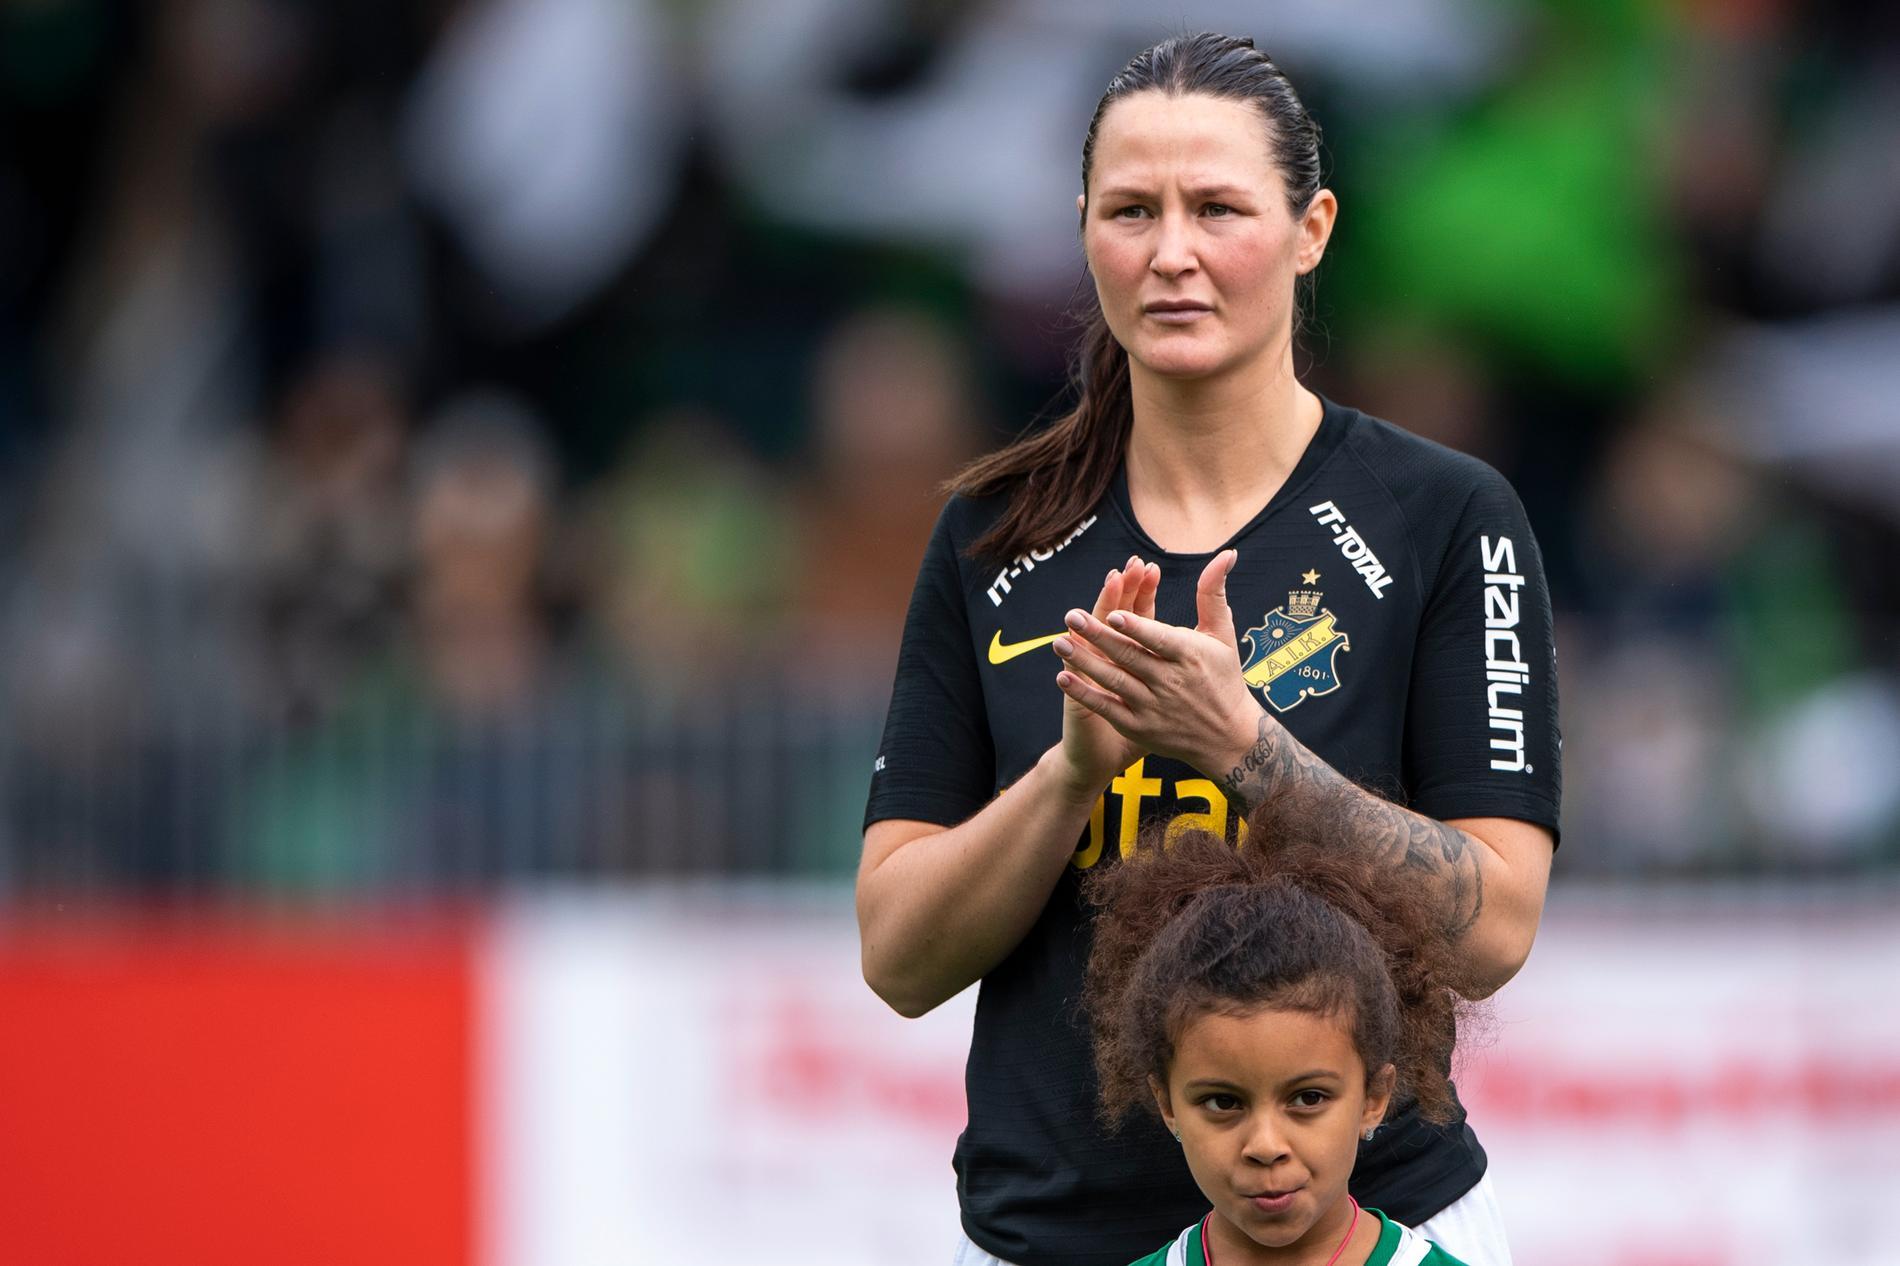 Nicole Odelberg Modins i AIK-tröjan i fjol.